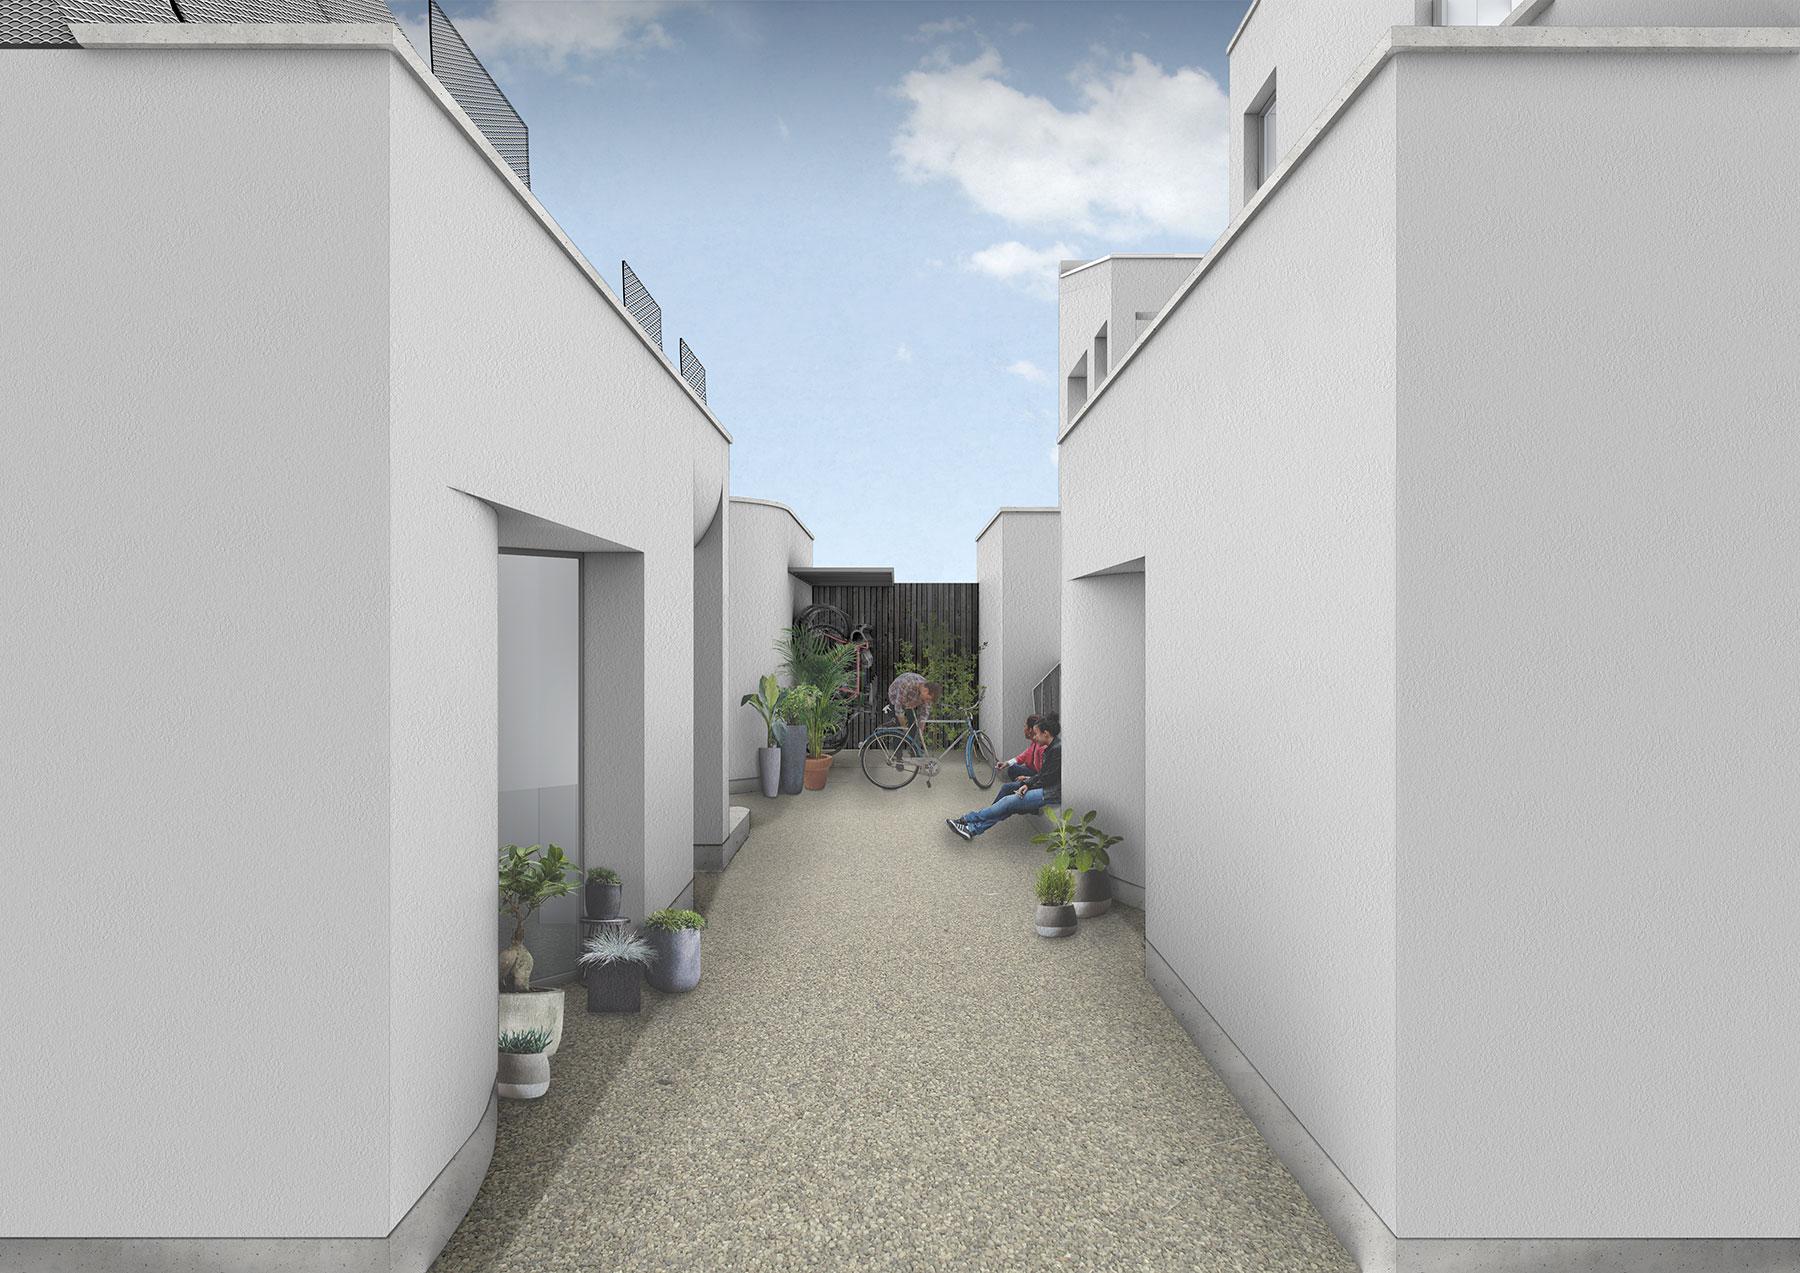 Courtyard-Perspective-02.jpg